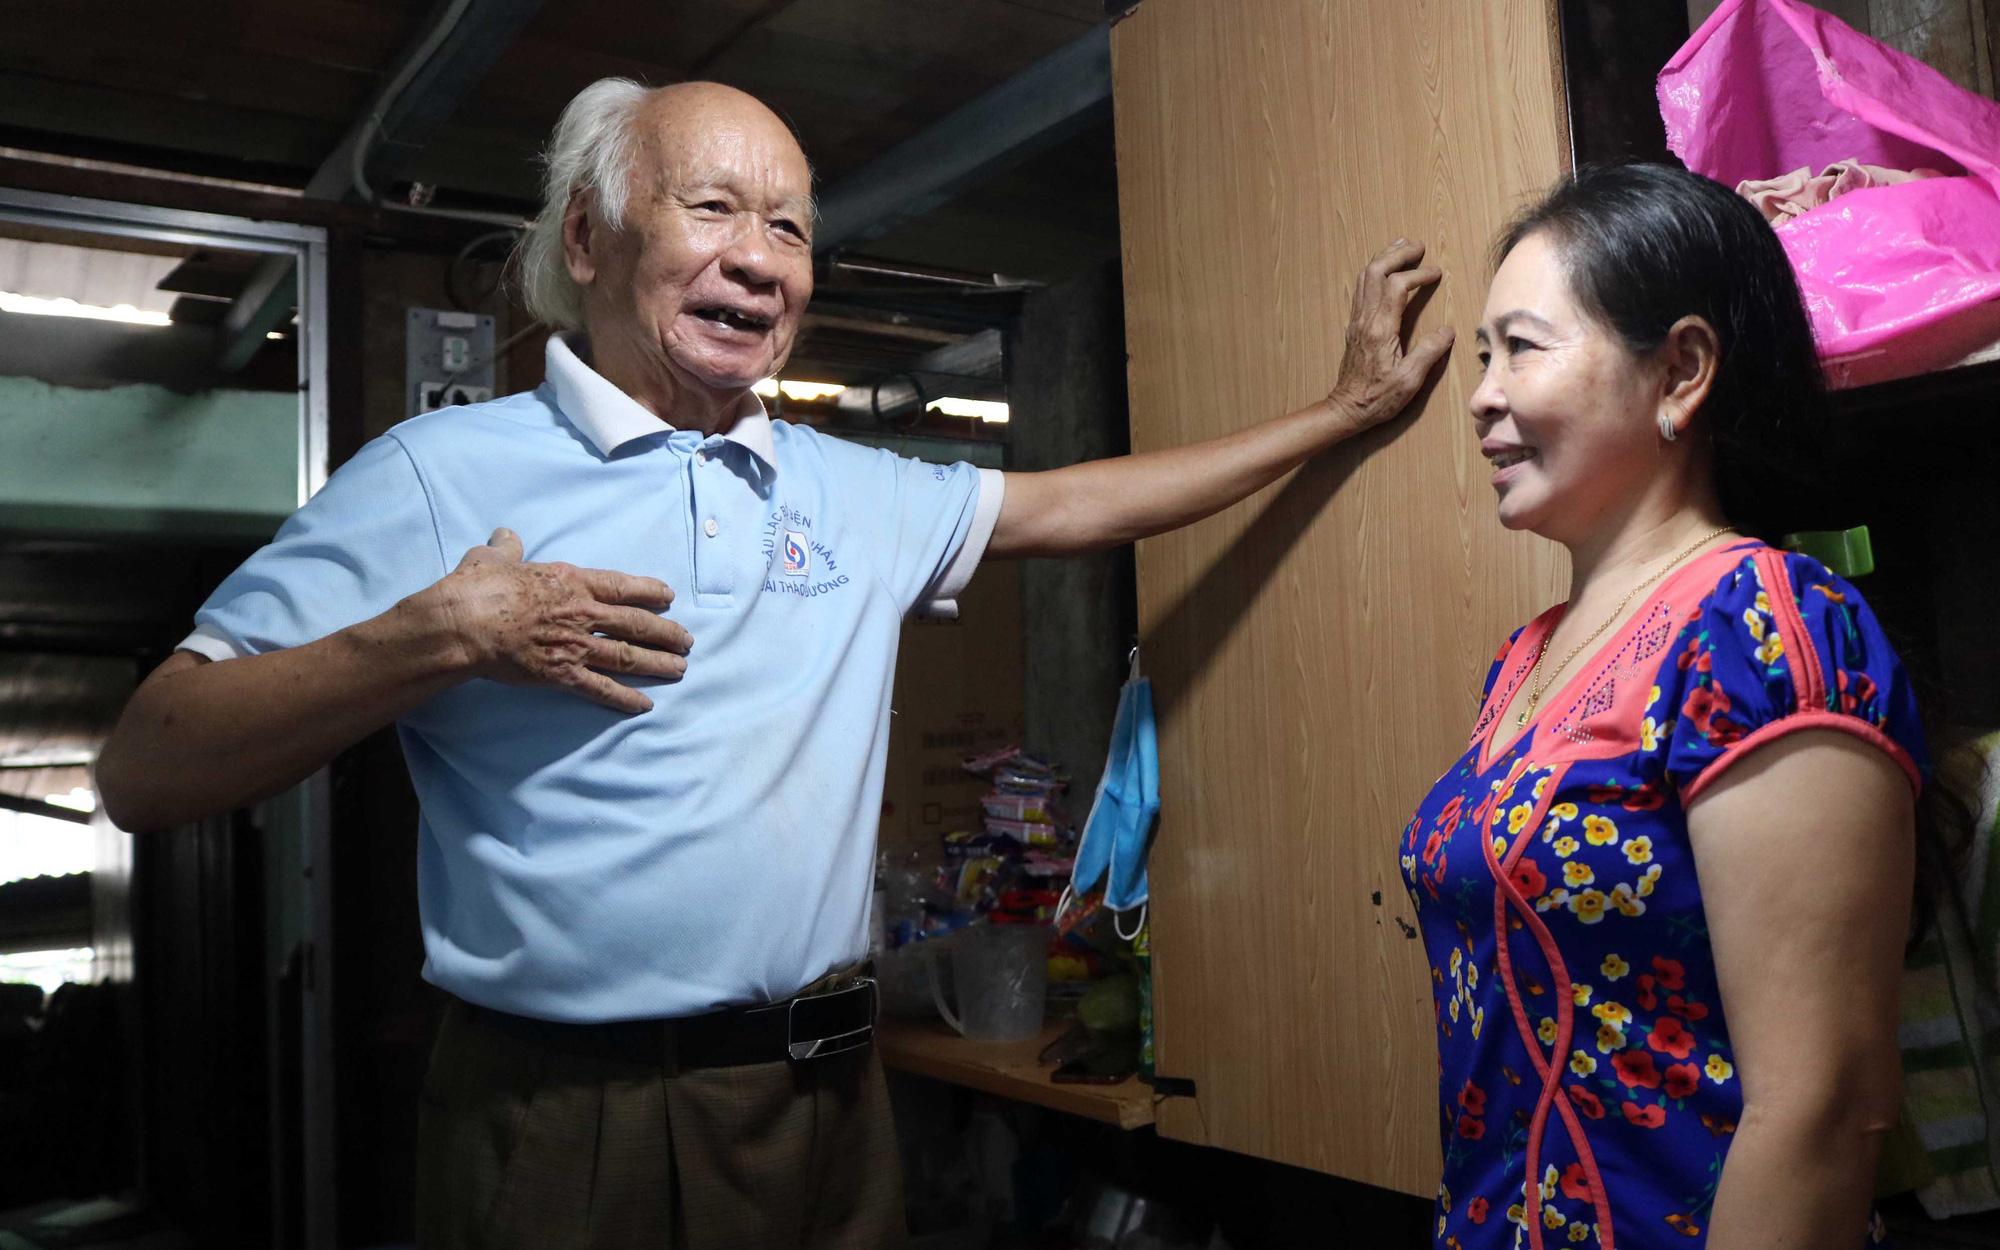 In Saigon, landlord runs 'emergency fund' for any dweller in distress